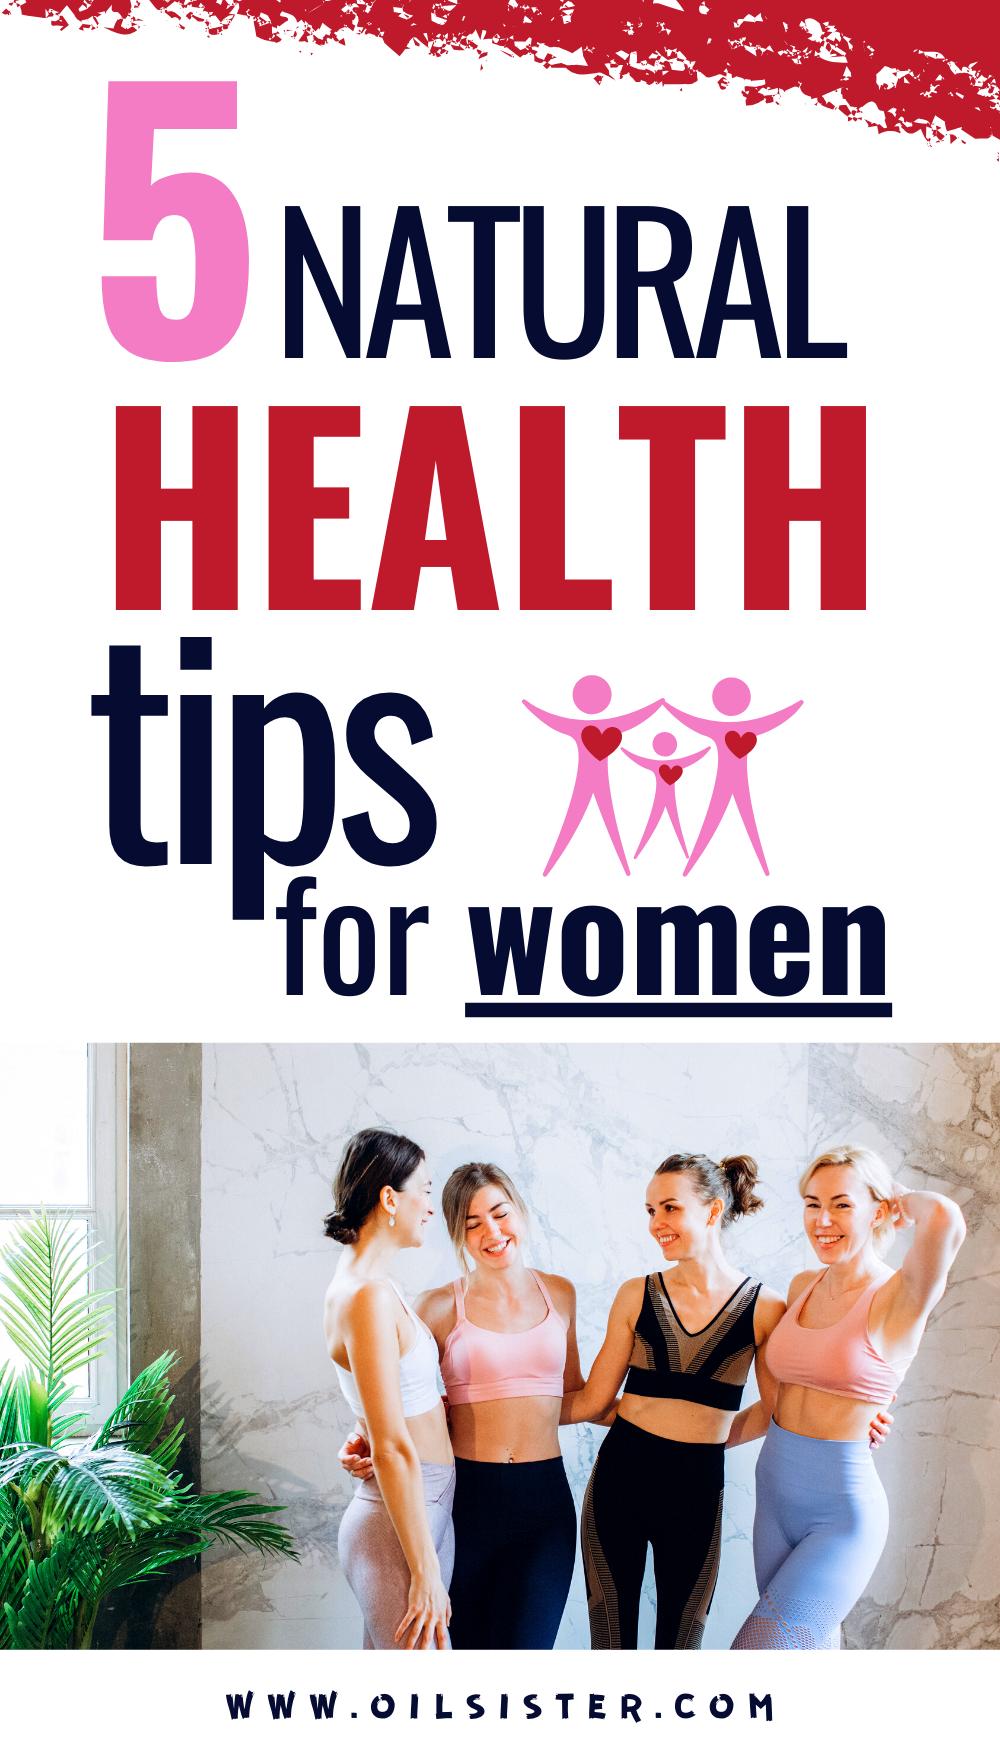 Women health tips natural